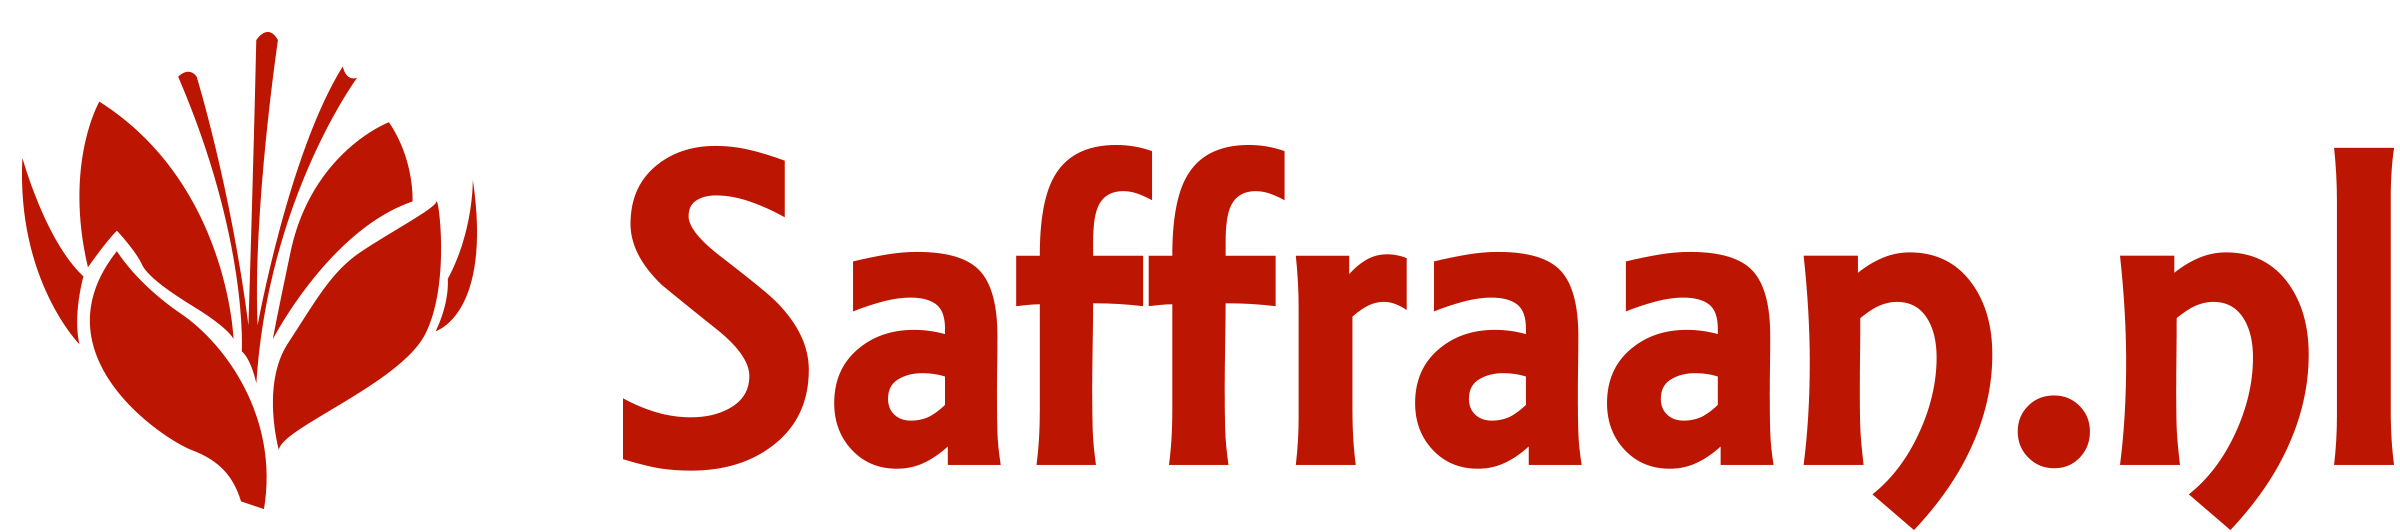 Saffraan.nl Logo